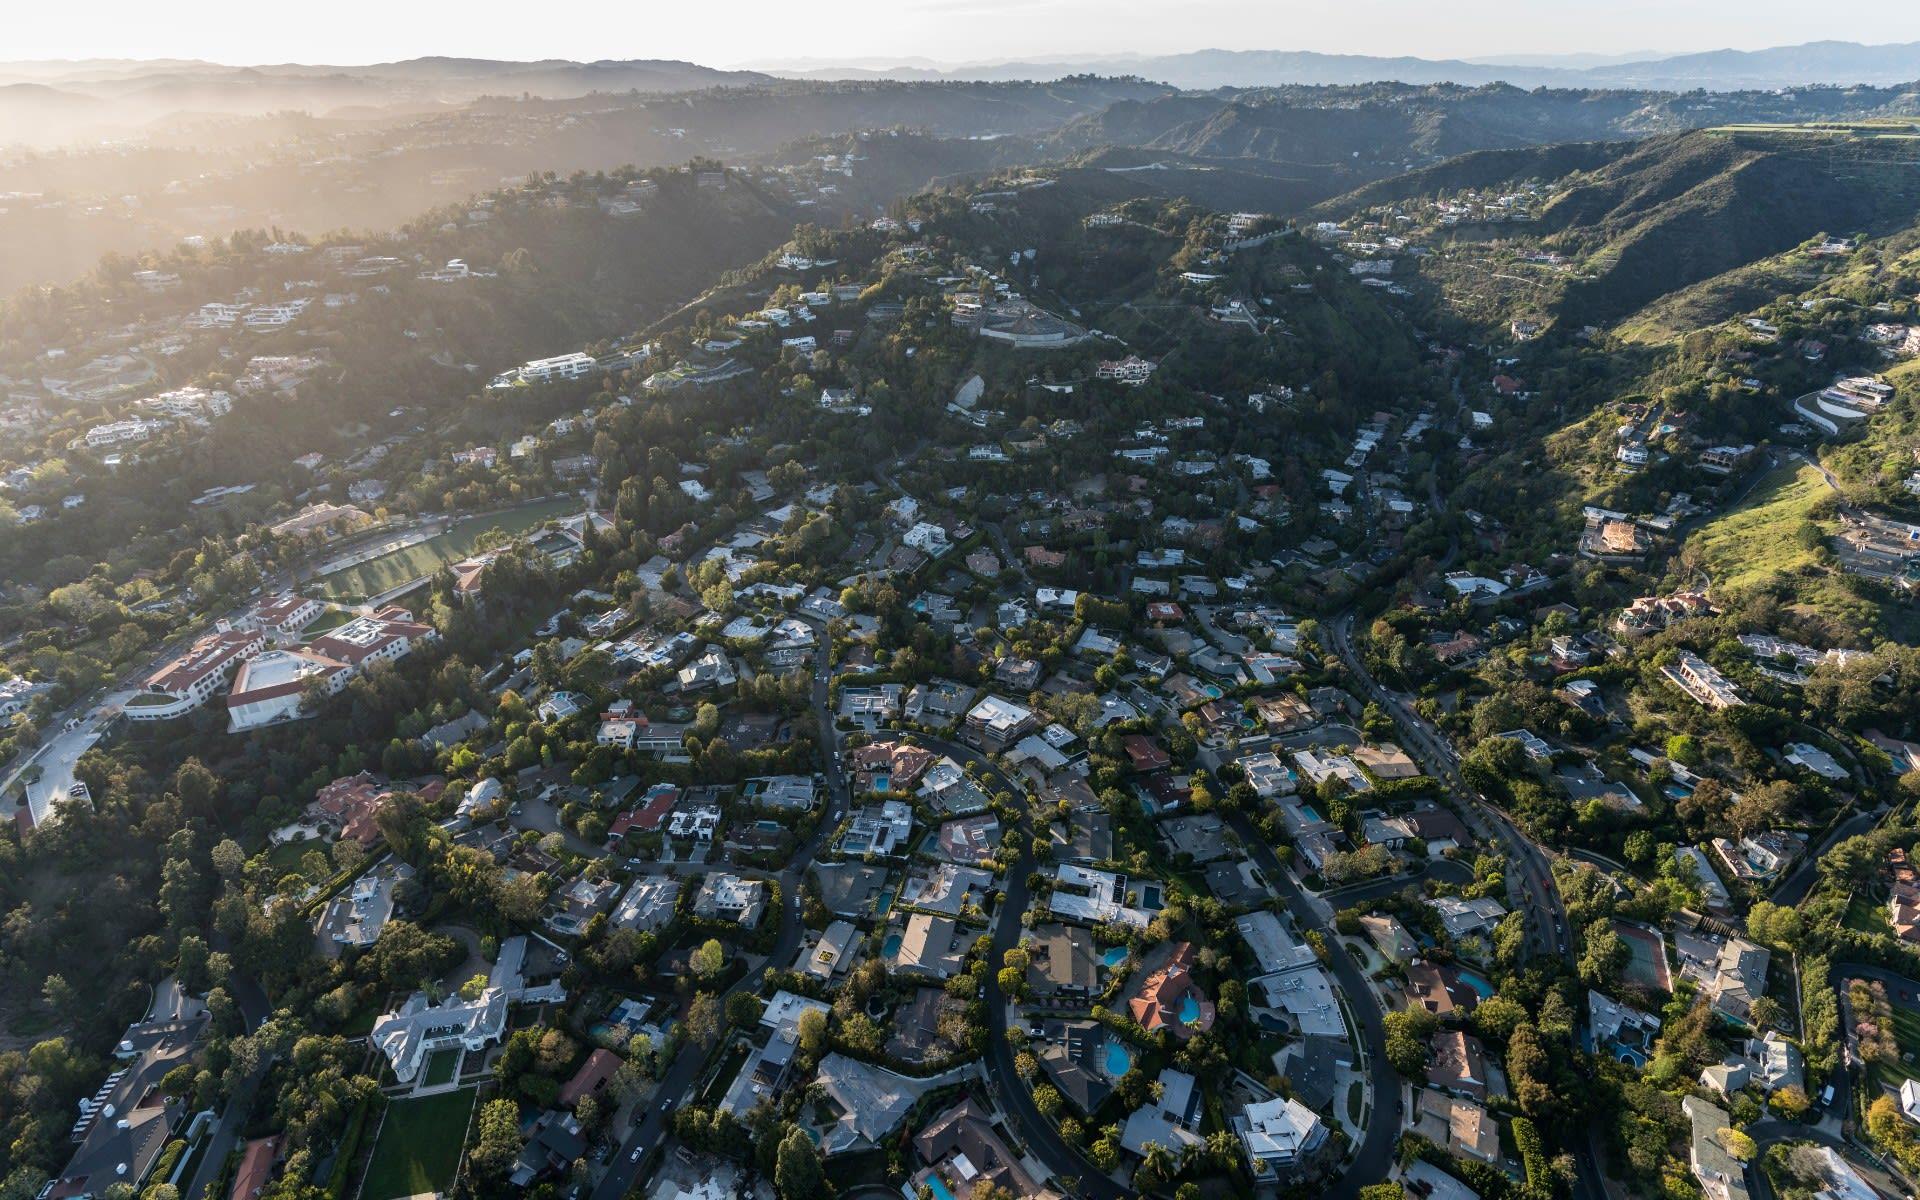 Bel Air-Holmby Hills